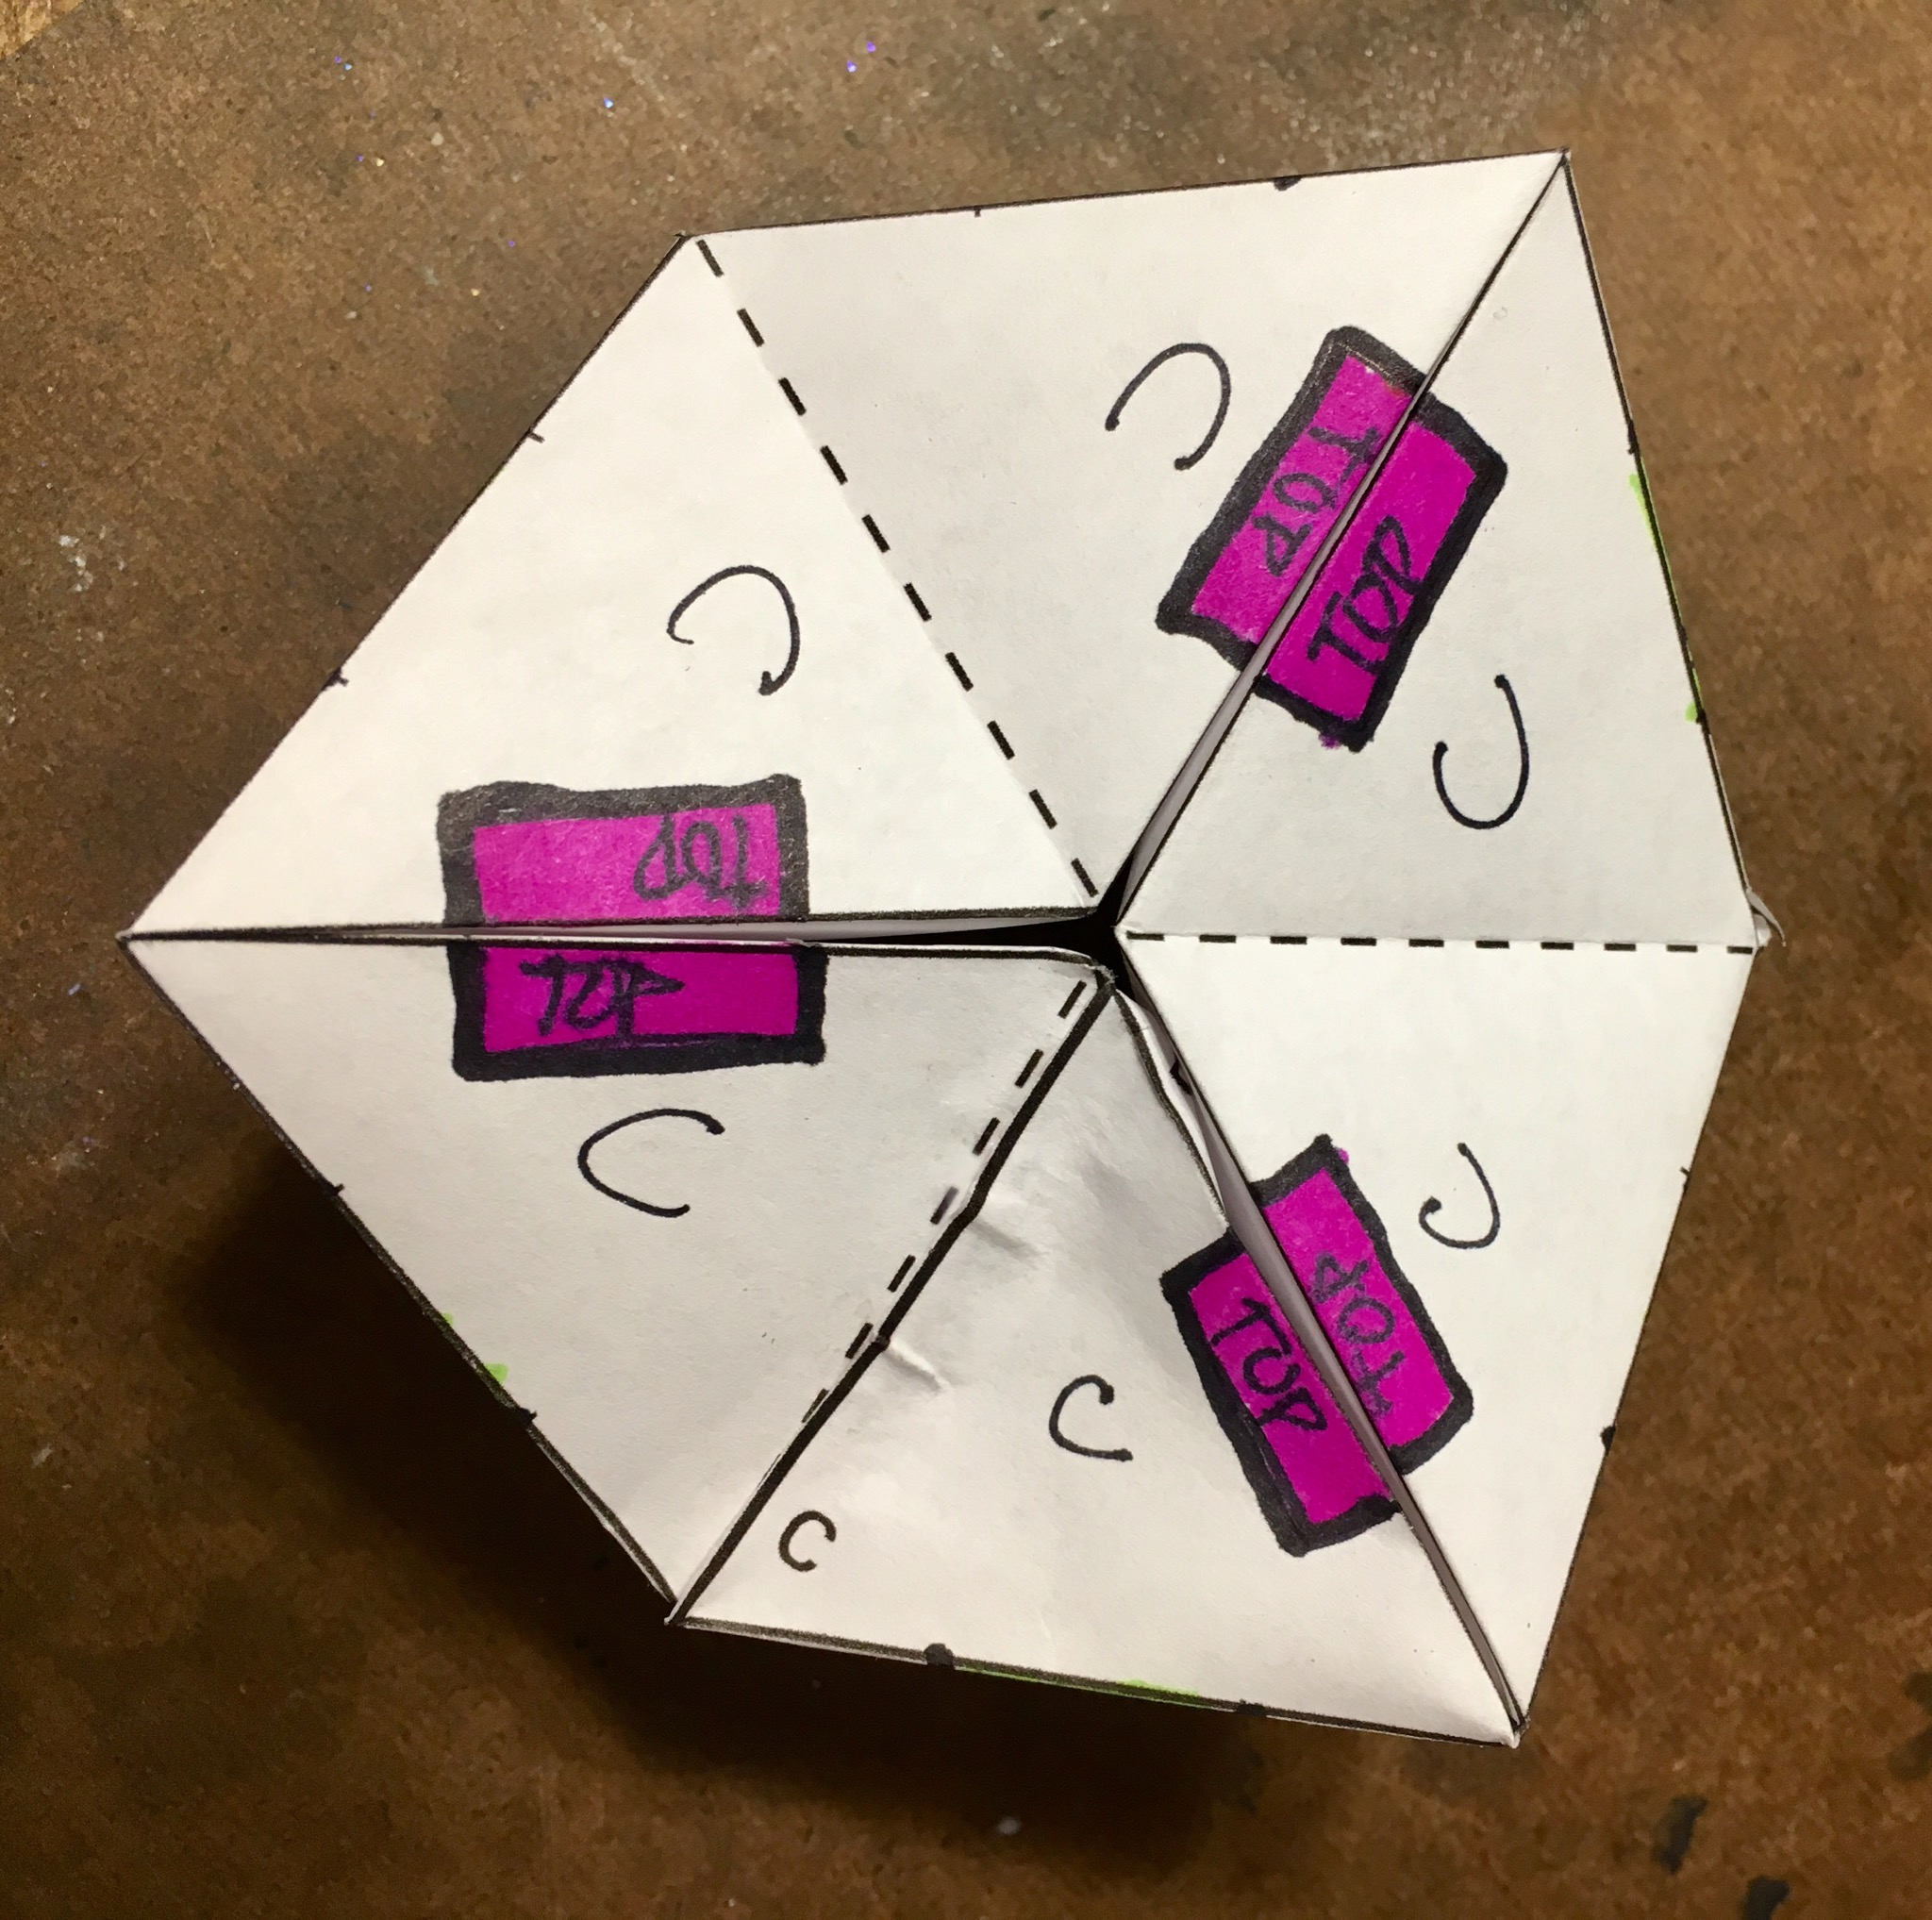 photograph regarding Flextangle Printable referred to as Flextangle STEAM Artwork Challenge - Generate Artwork with ME